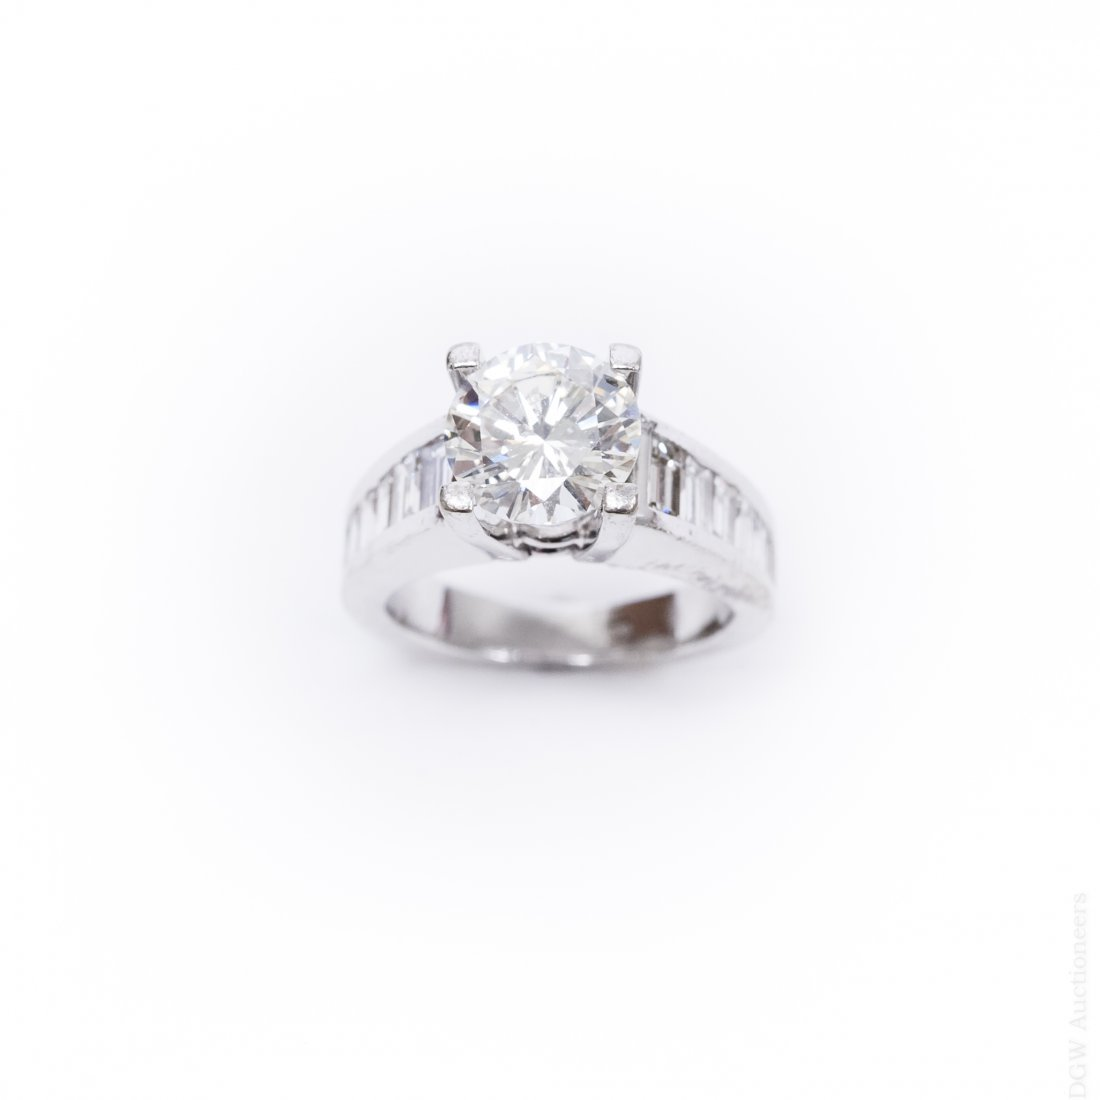 18K White Gold & Diamond Ring. 2.17 ct Center Diamond.